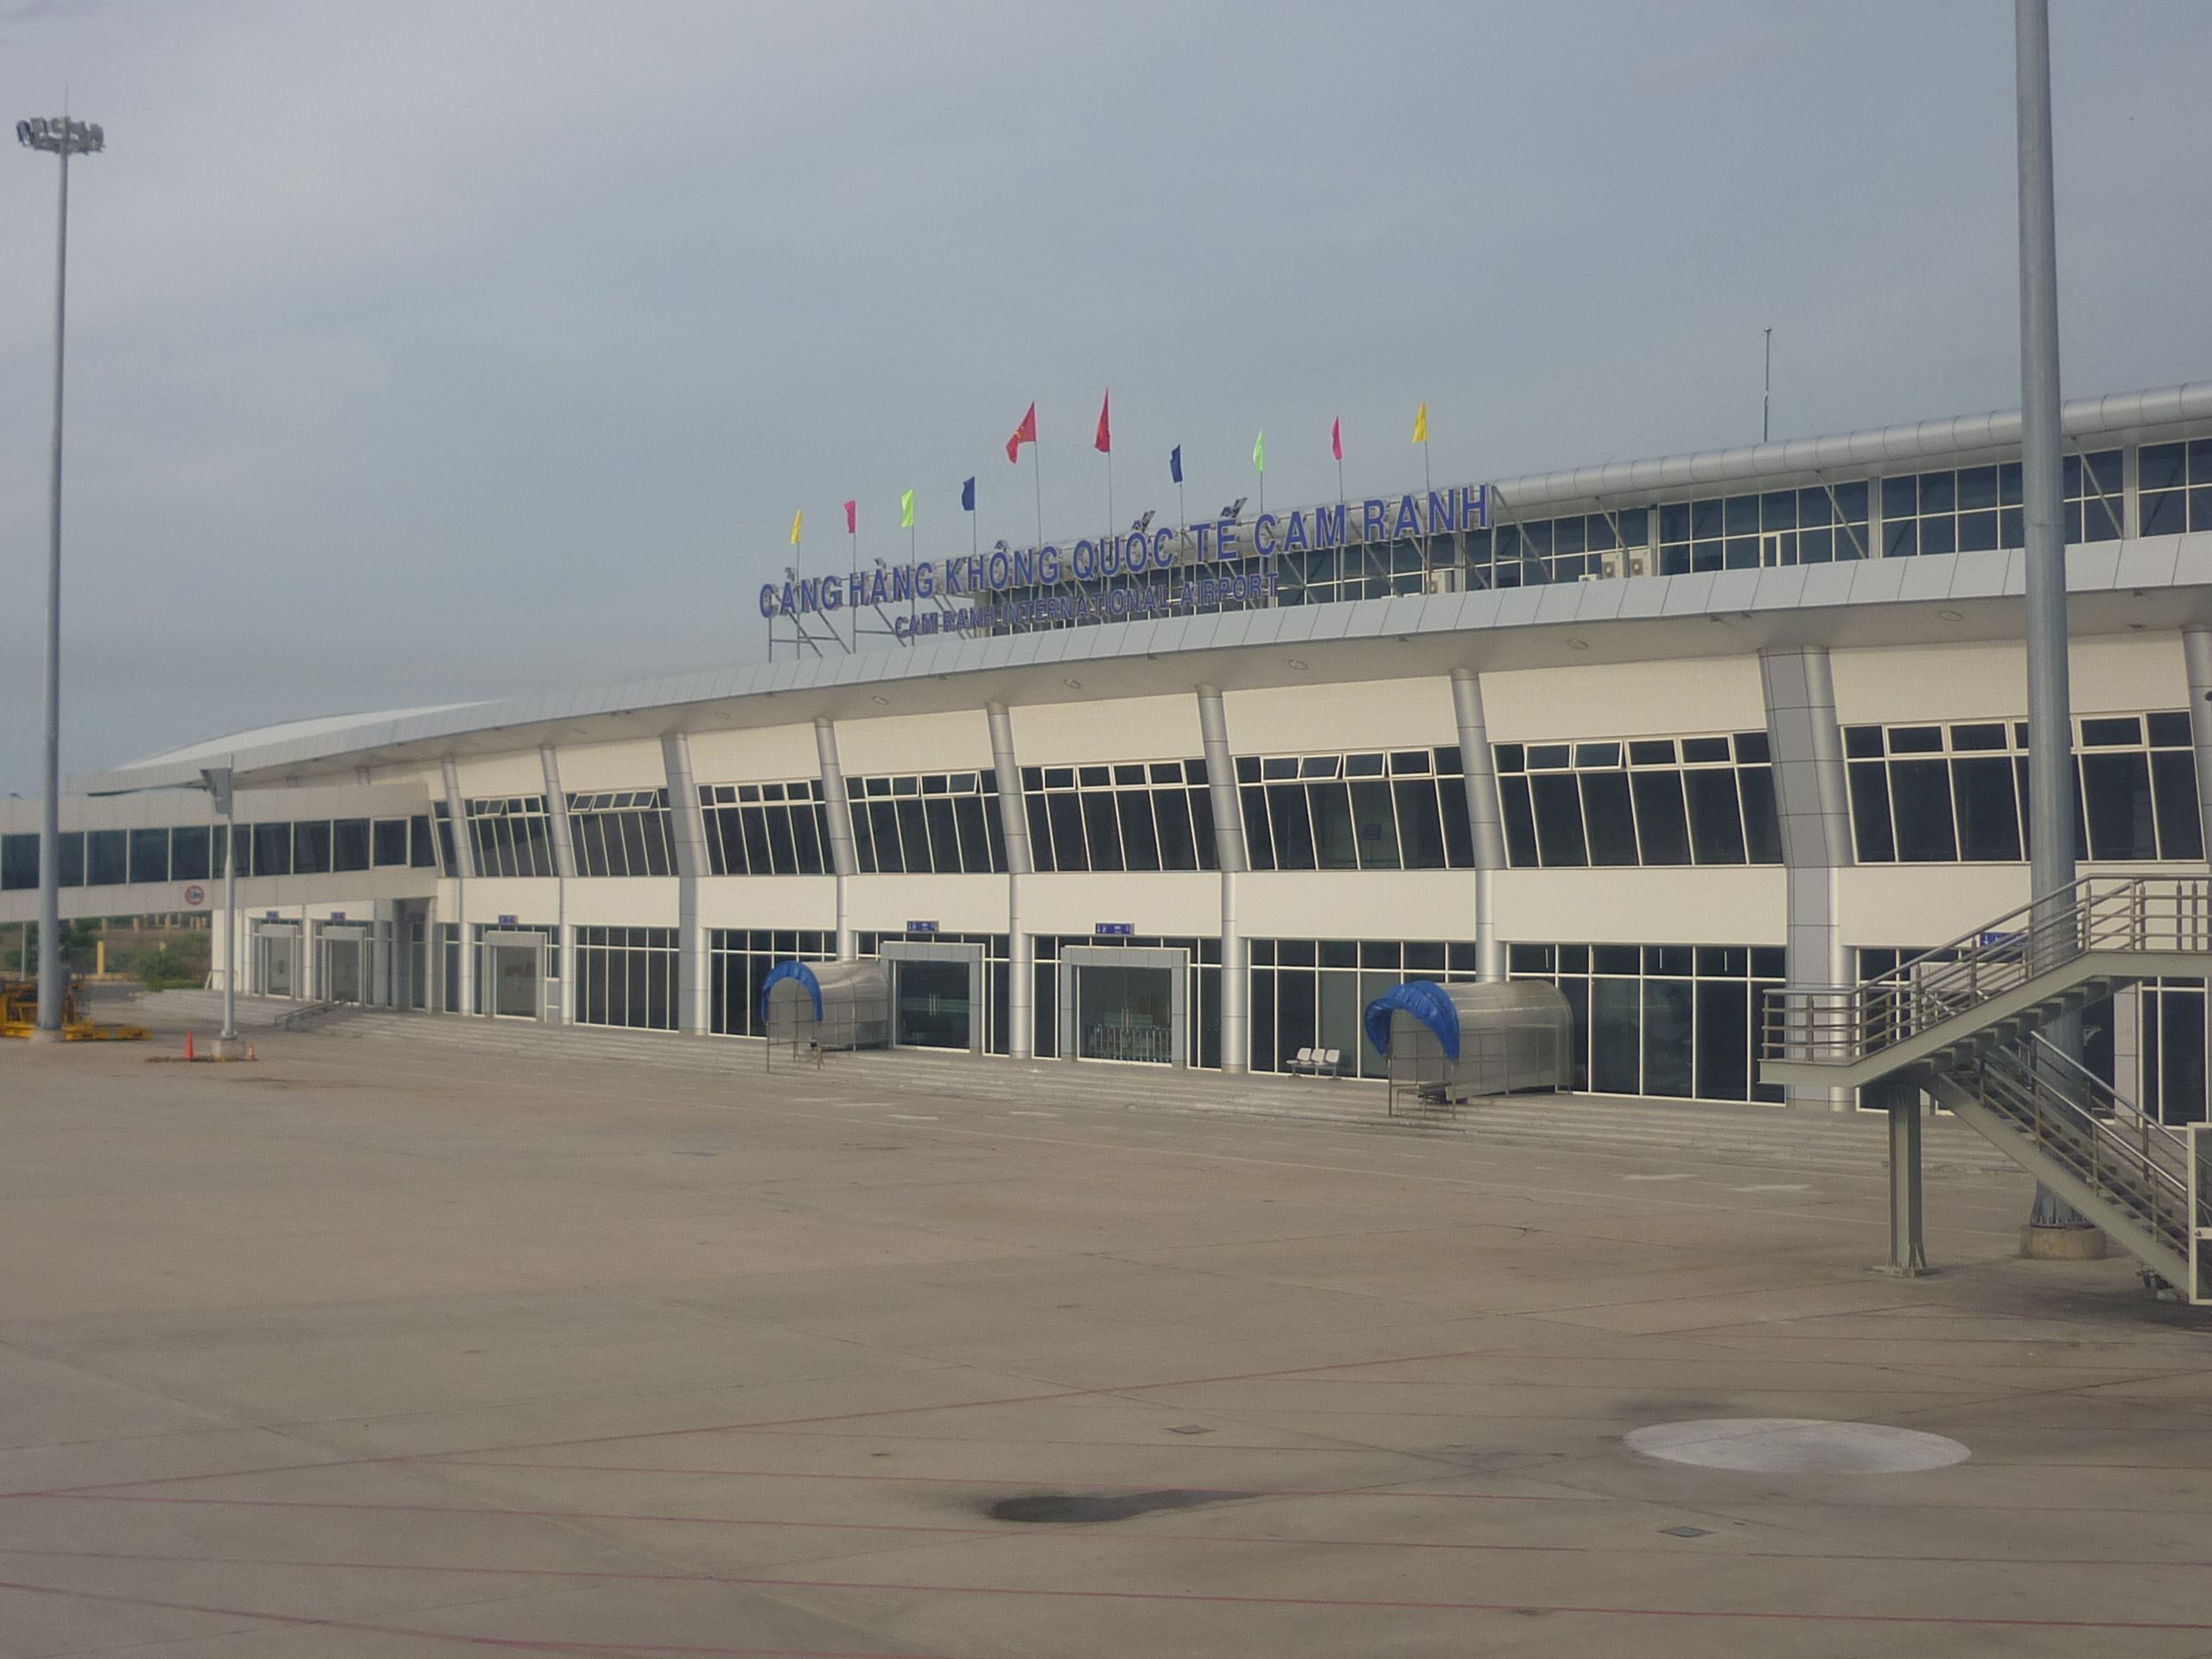 Aéroport de Cam Ranh Nha Trang (l'aéroport international de Cam Ranh Nha Trang) .1